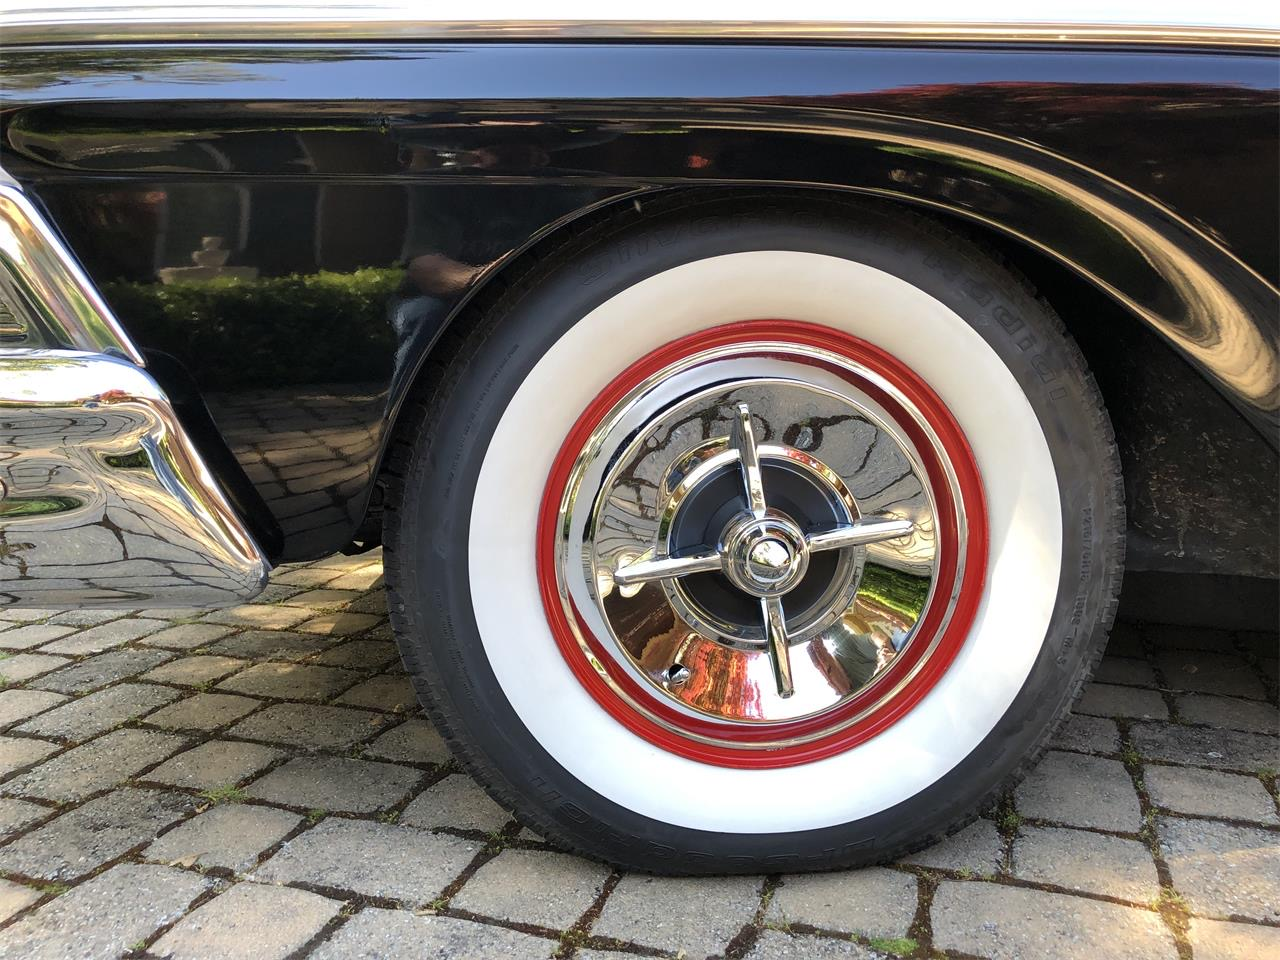 1958 Ford Ranchero, 1958 Ranchero gets performance updates, ClassicCars.com Journal